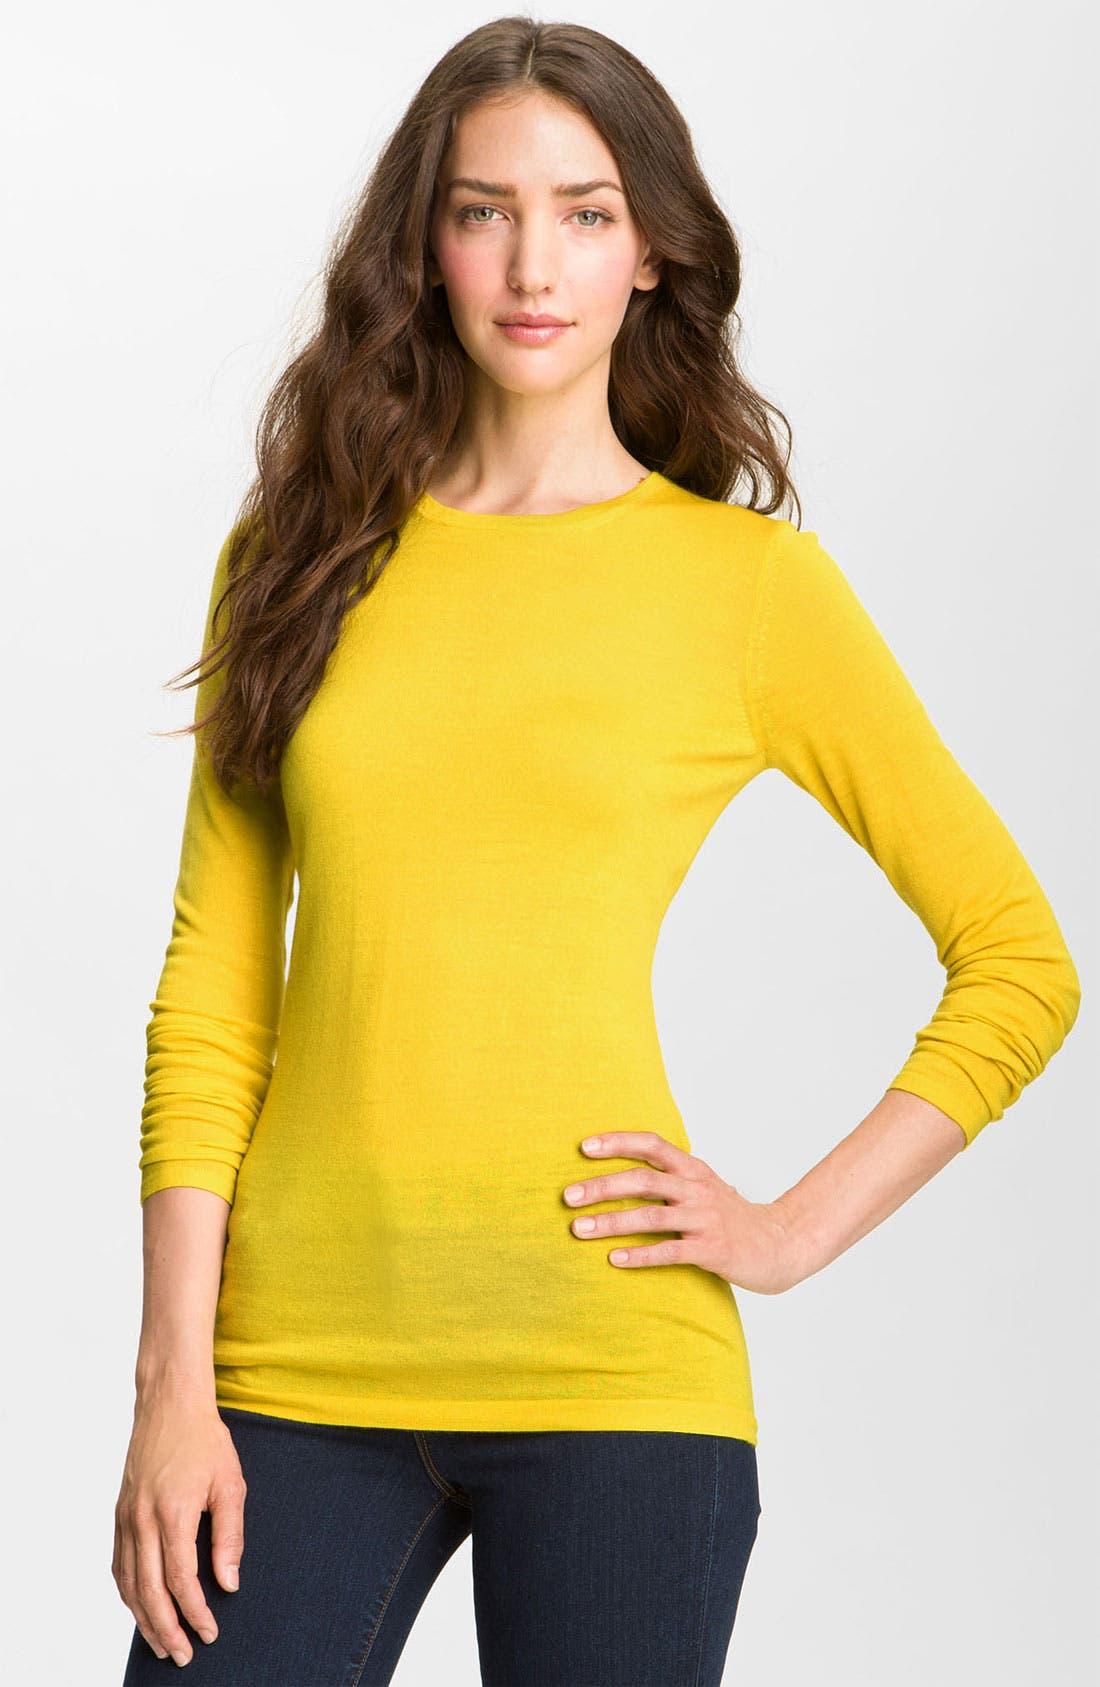 Alternate Image 1 Selected - Valette Refined Wool Crewneck Sweater